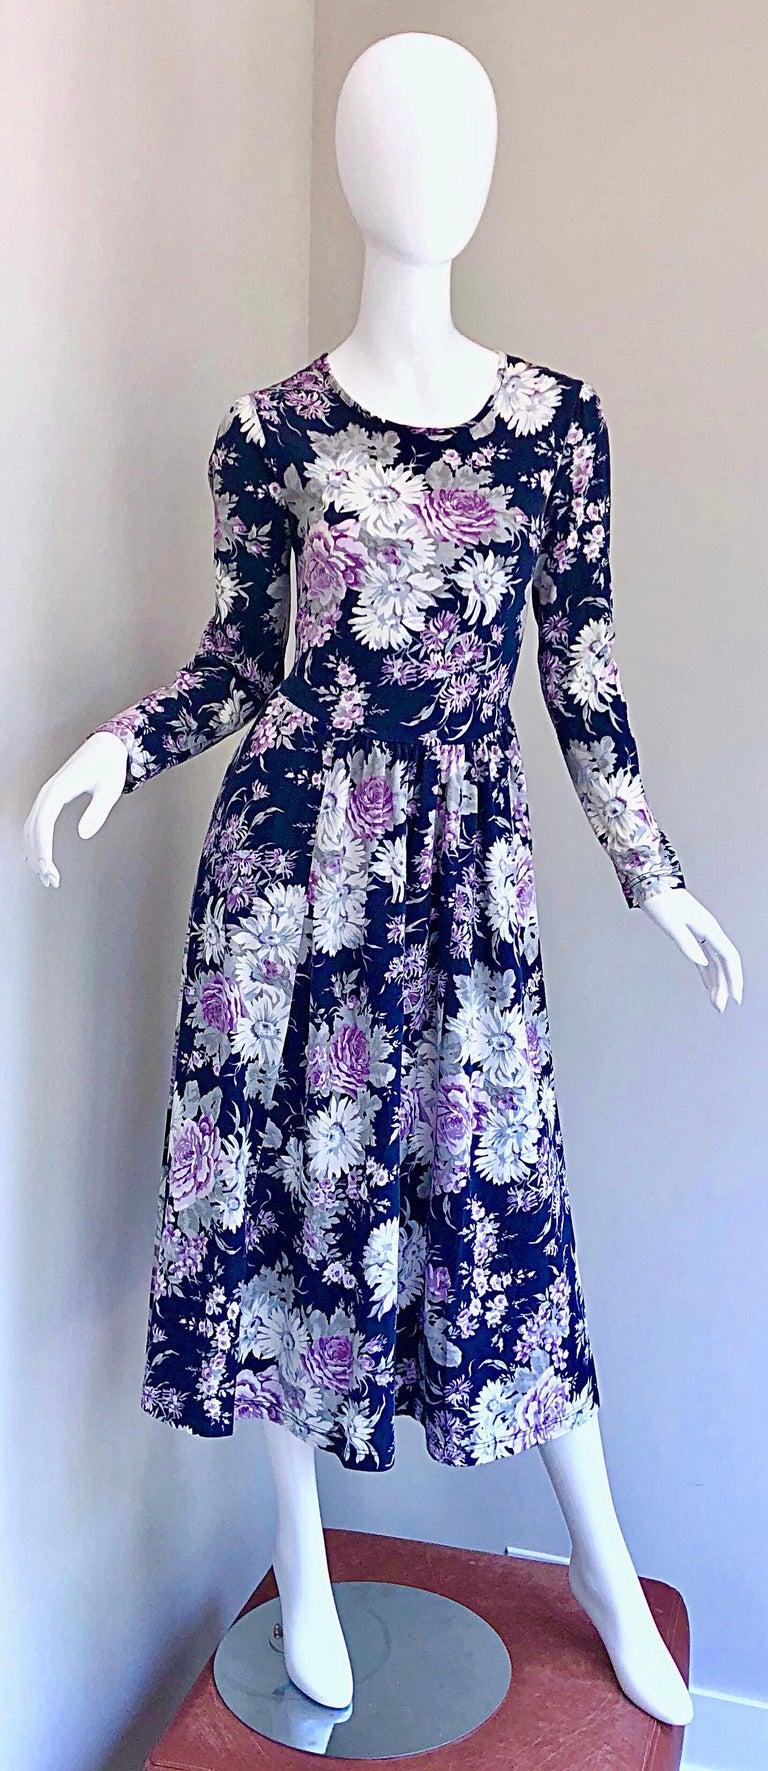 1990s Laura Ashley Navy Blue + Purple Long Sleeve Cotton Vintage 90s Midi Dress For Sale 9